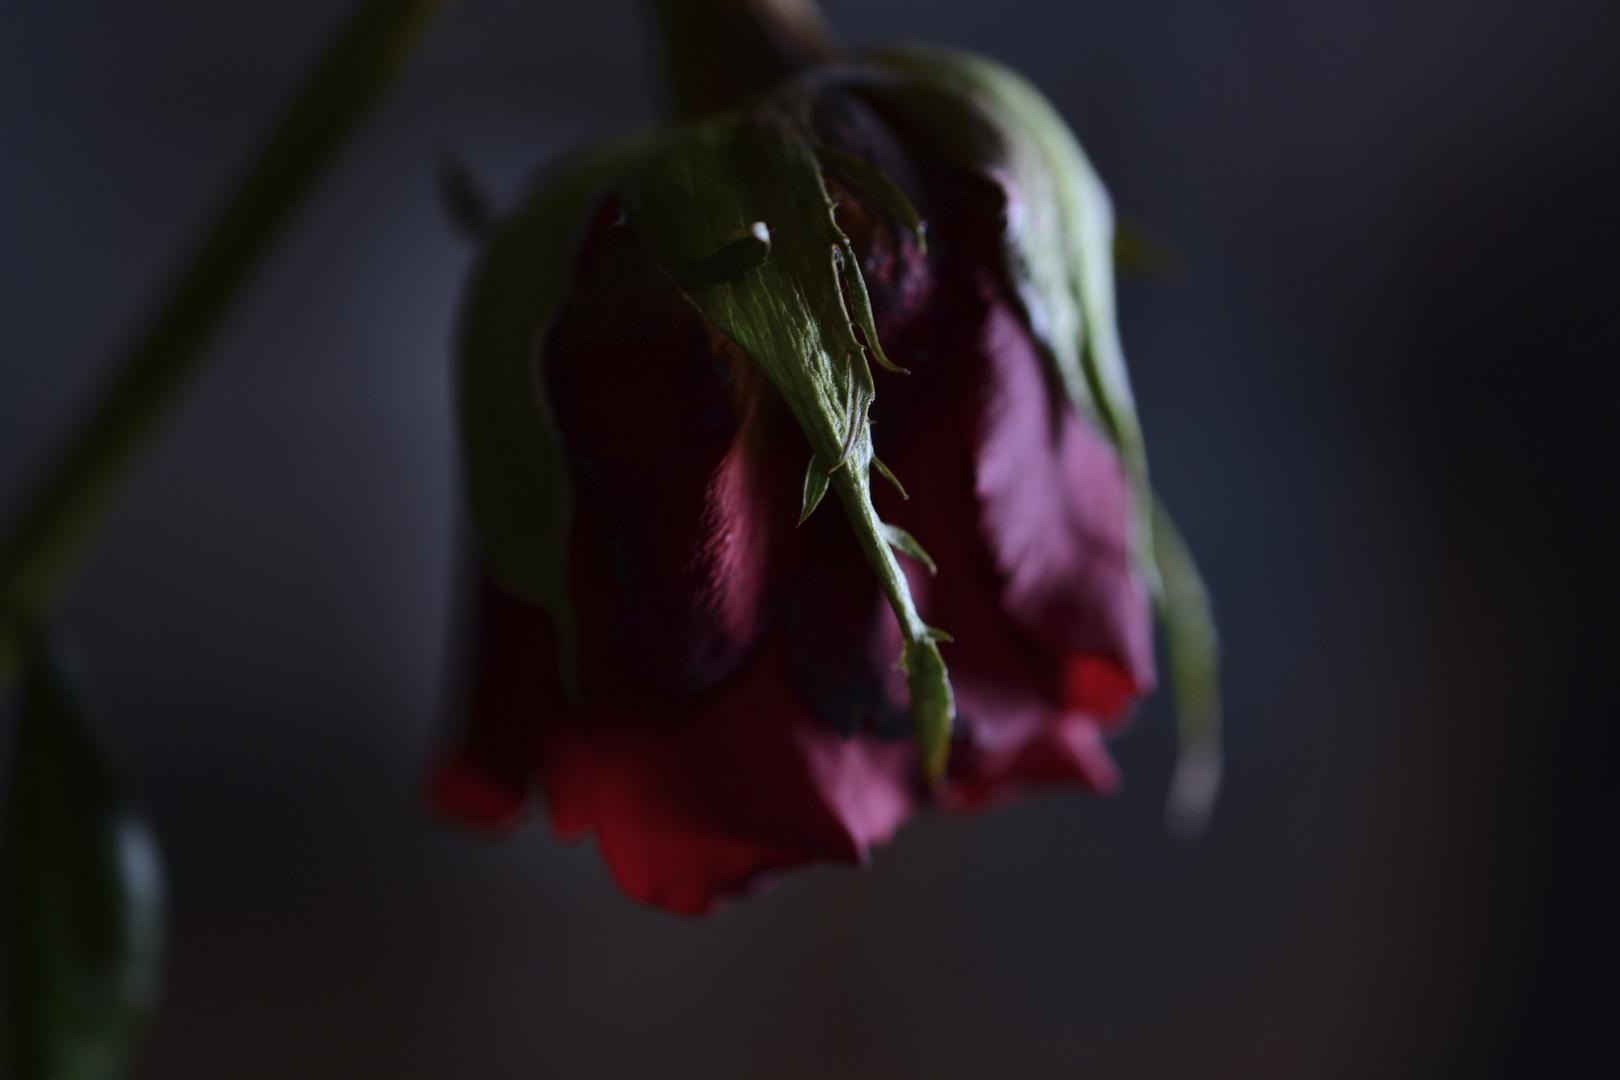 Liebe endet